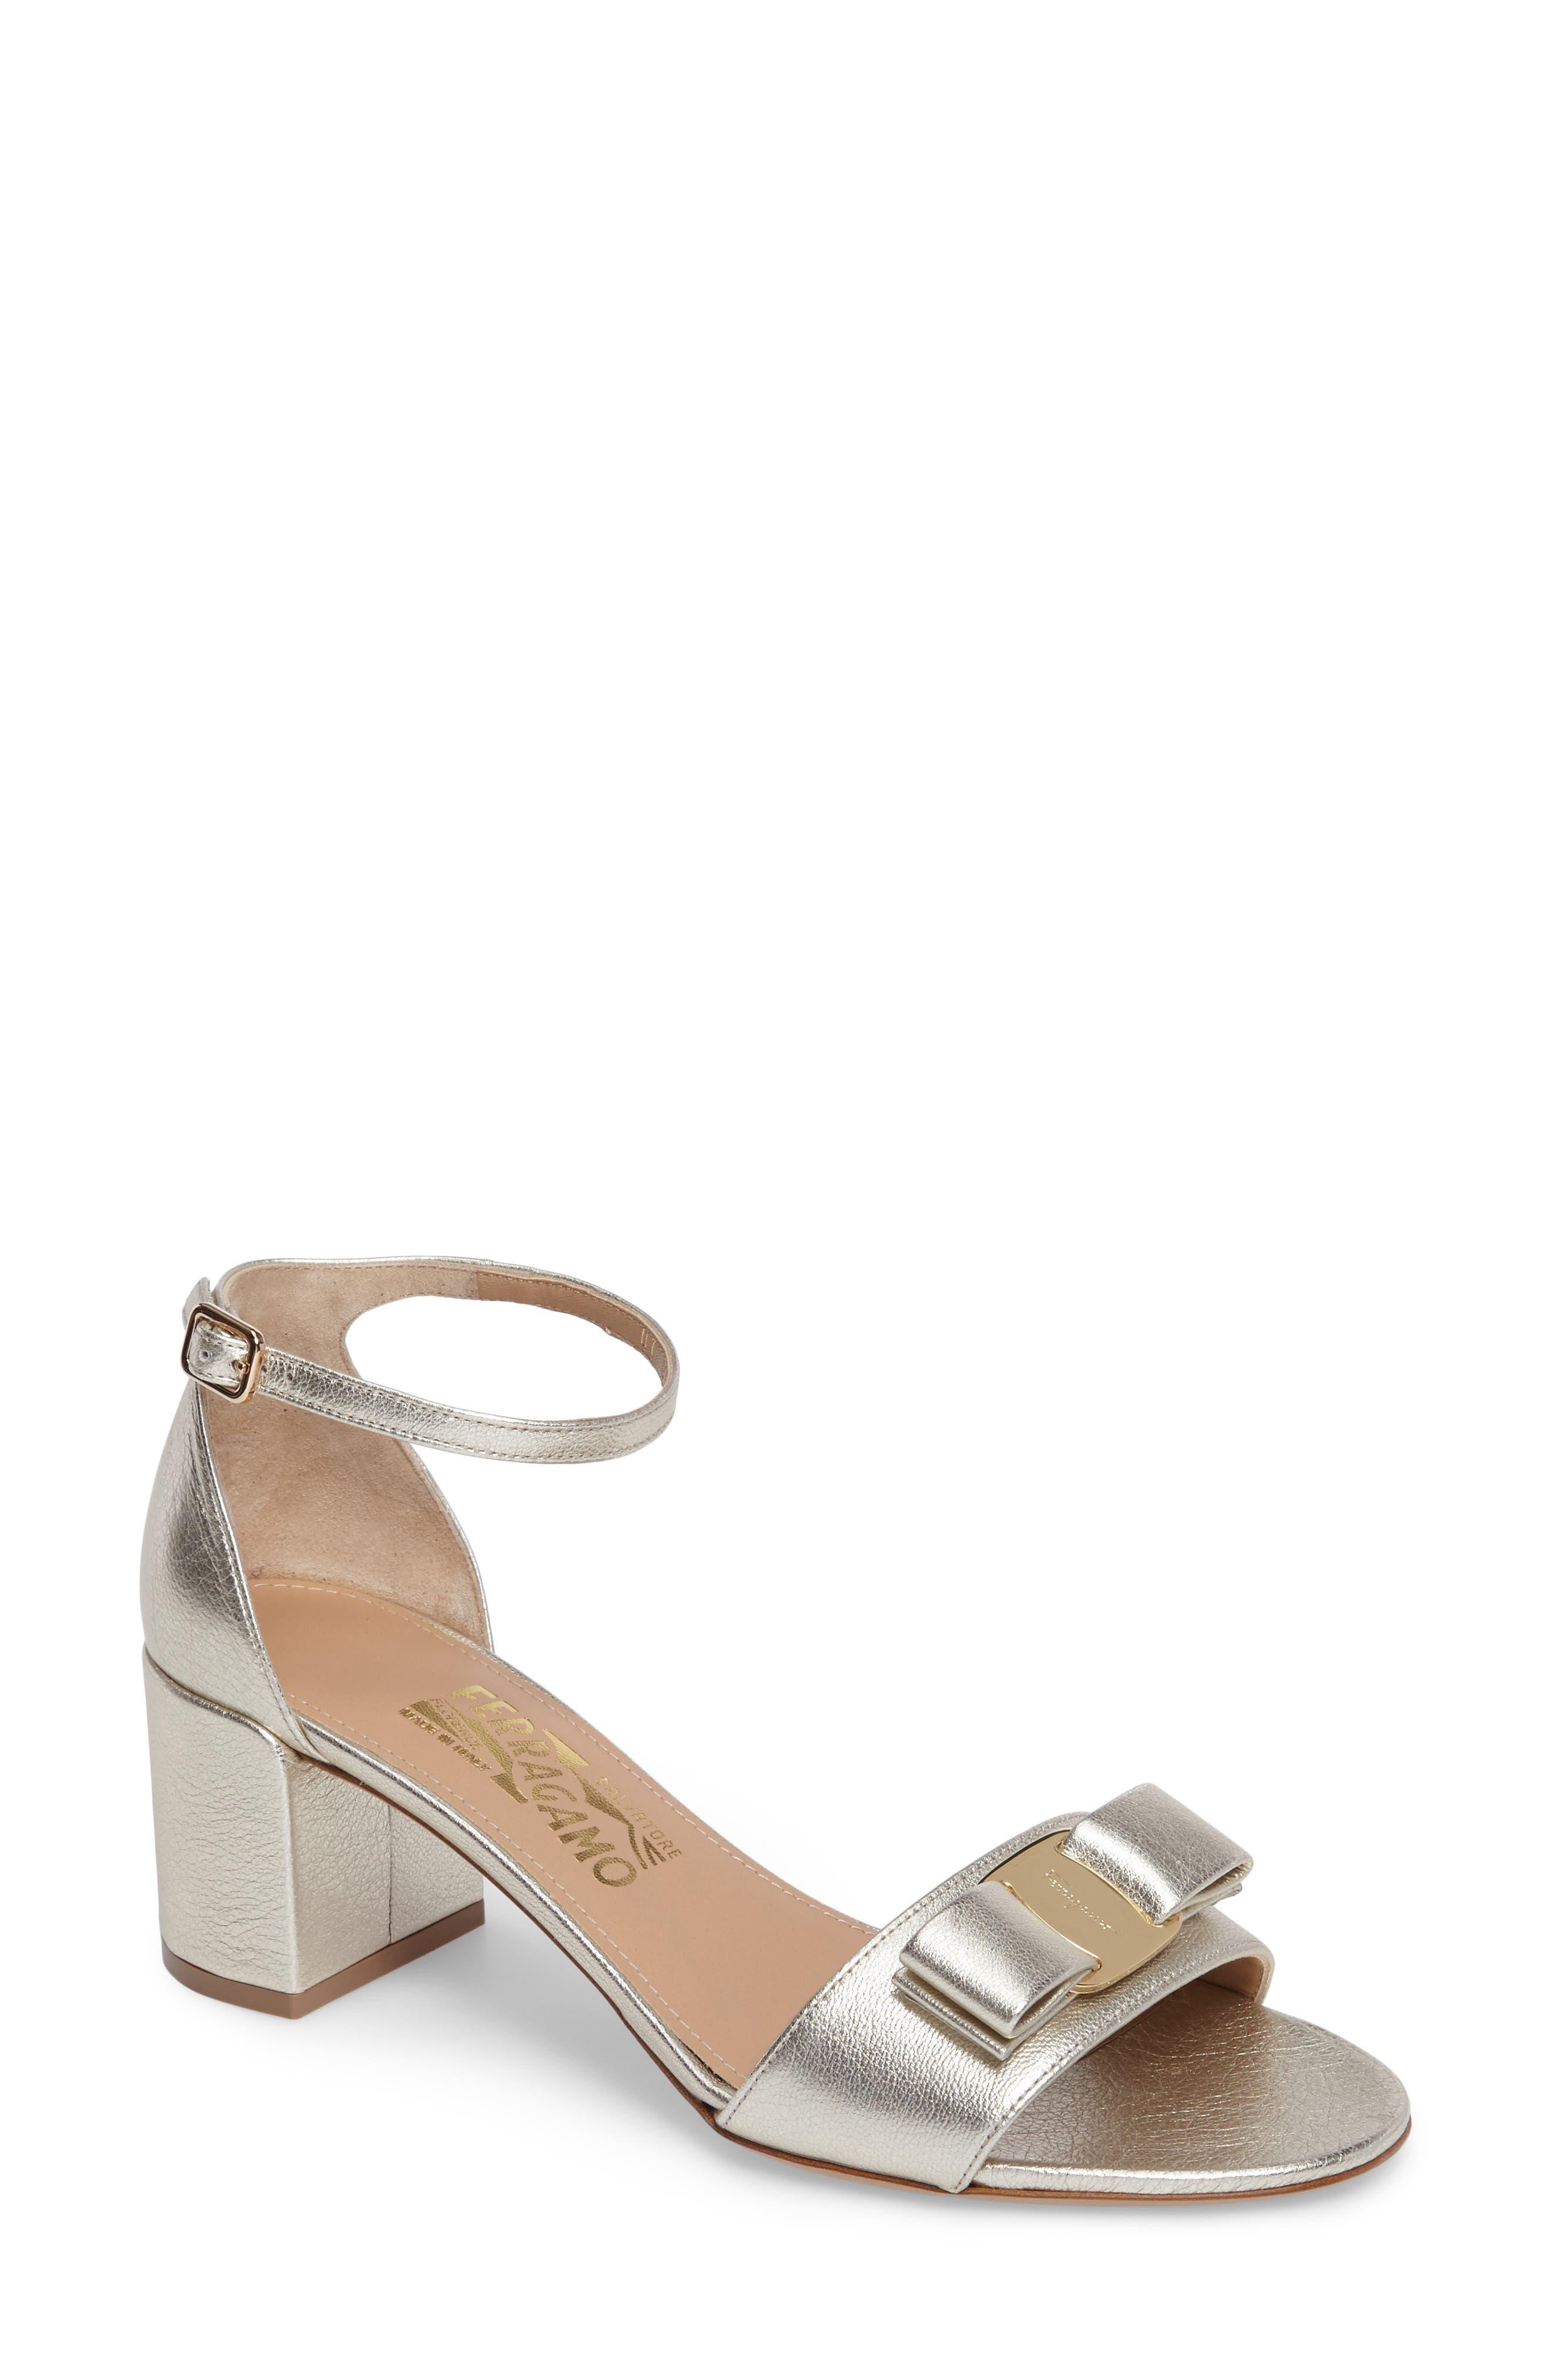 Gavina Block Heel Bow Sandal,                         Main,                         color, METALLIC SILVER